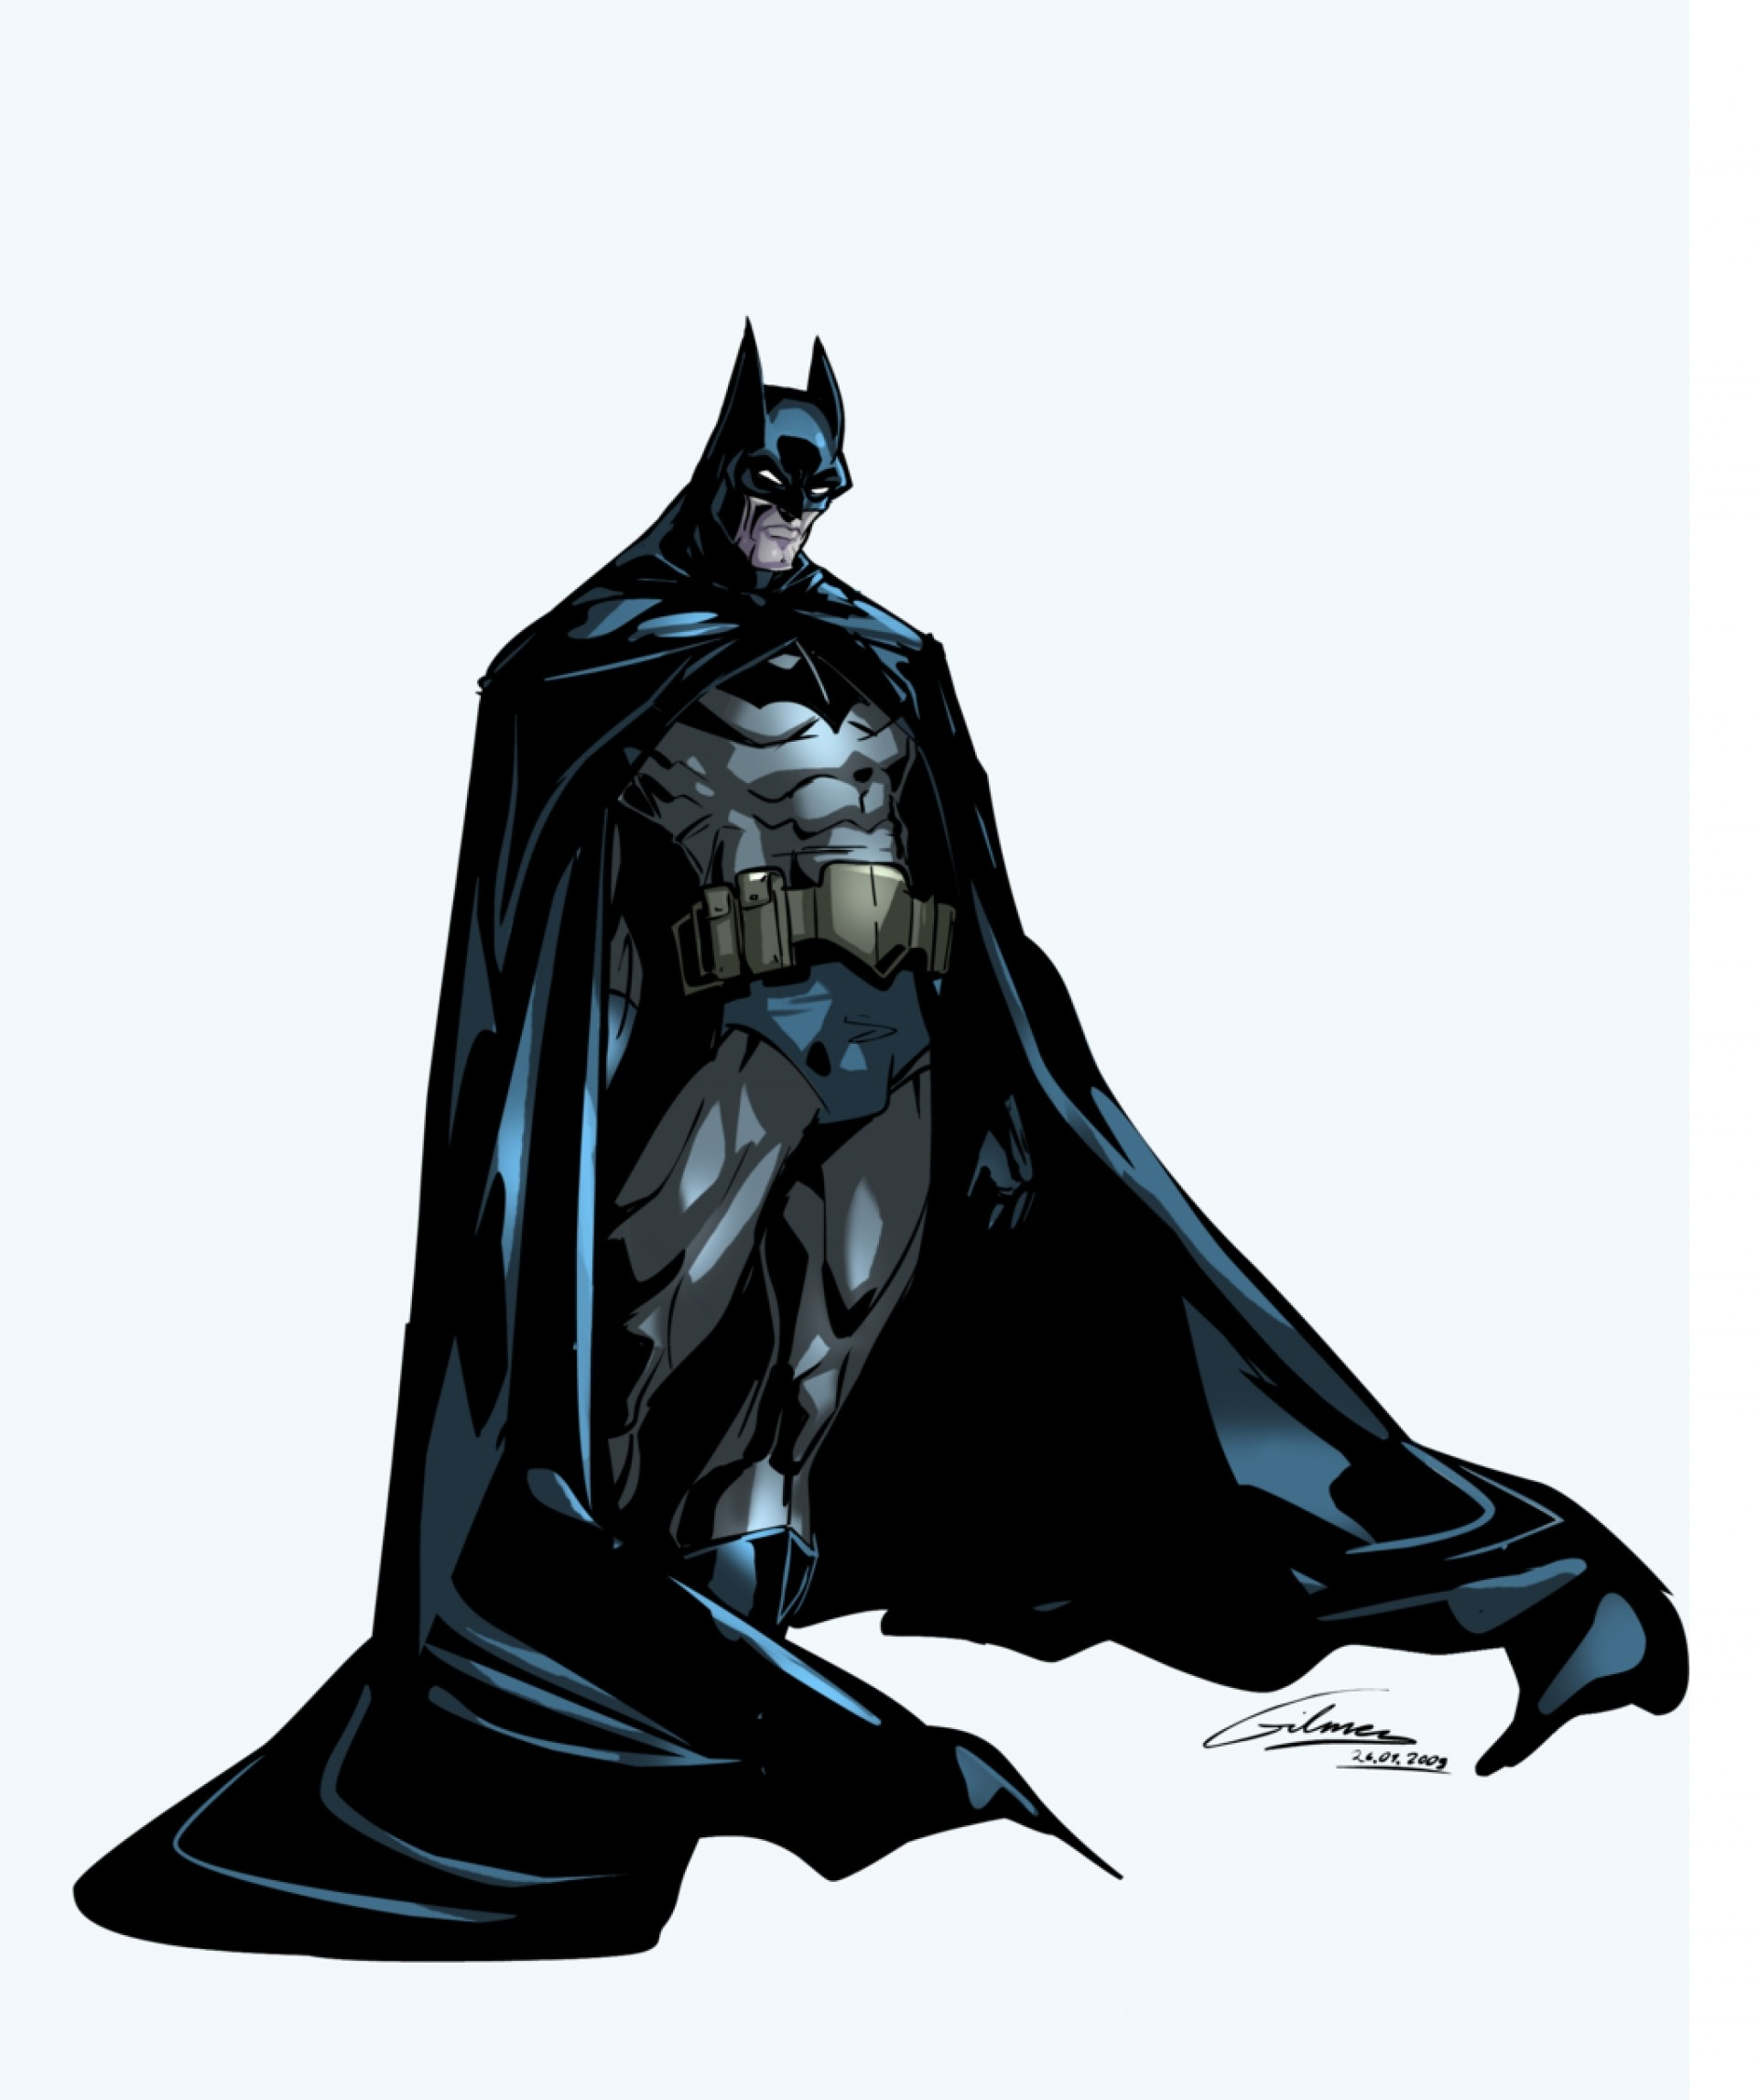 Famous Batman Cartoon HD Image Wallpaper Download Â« Anime Cartoon Wallpaper